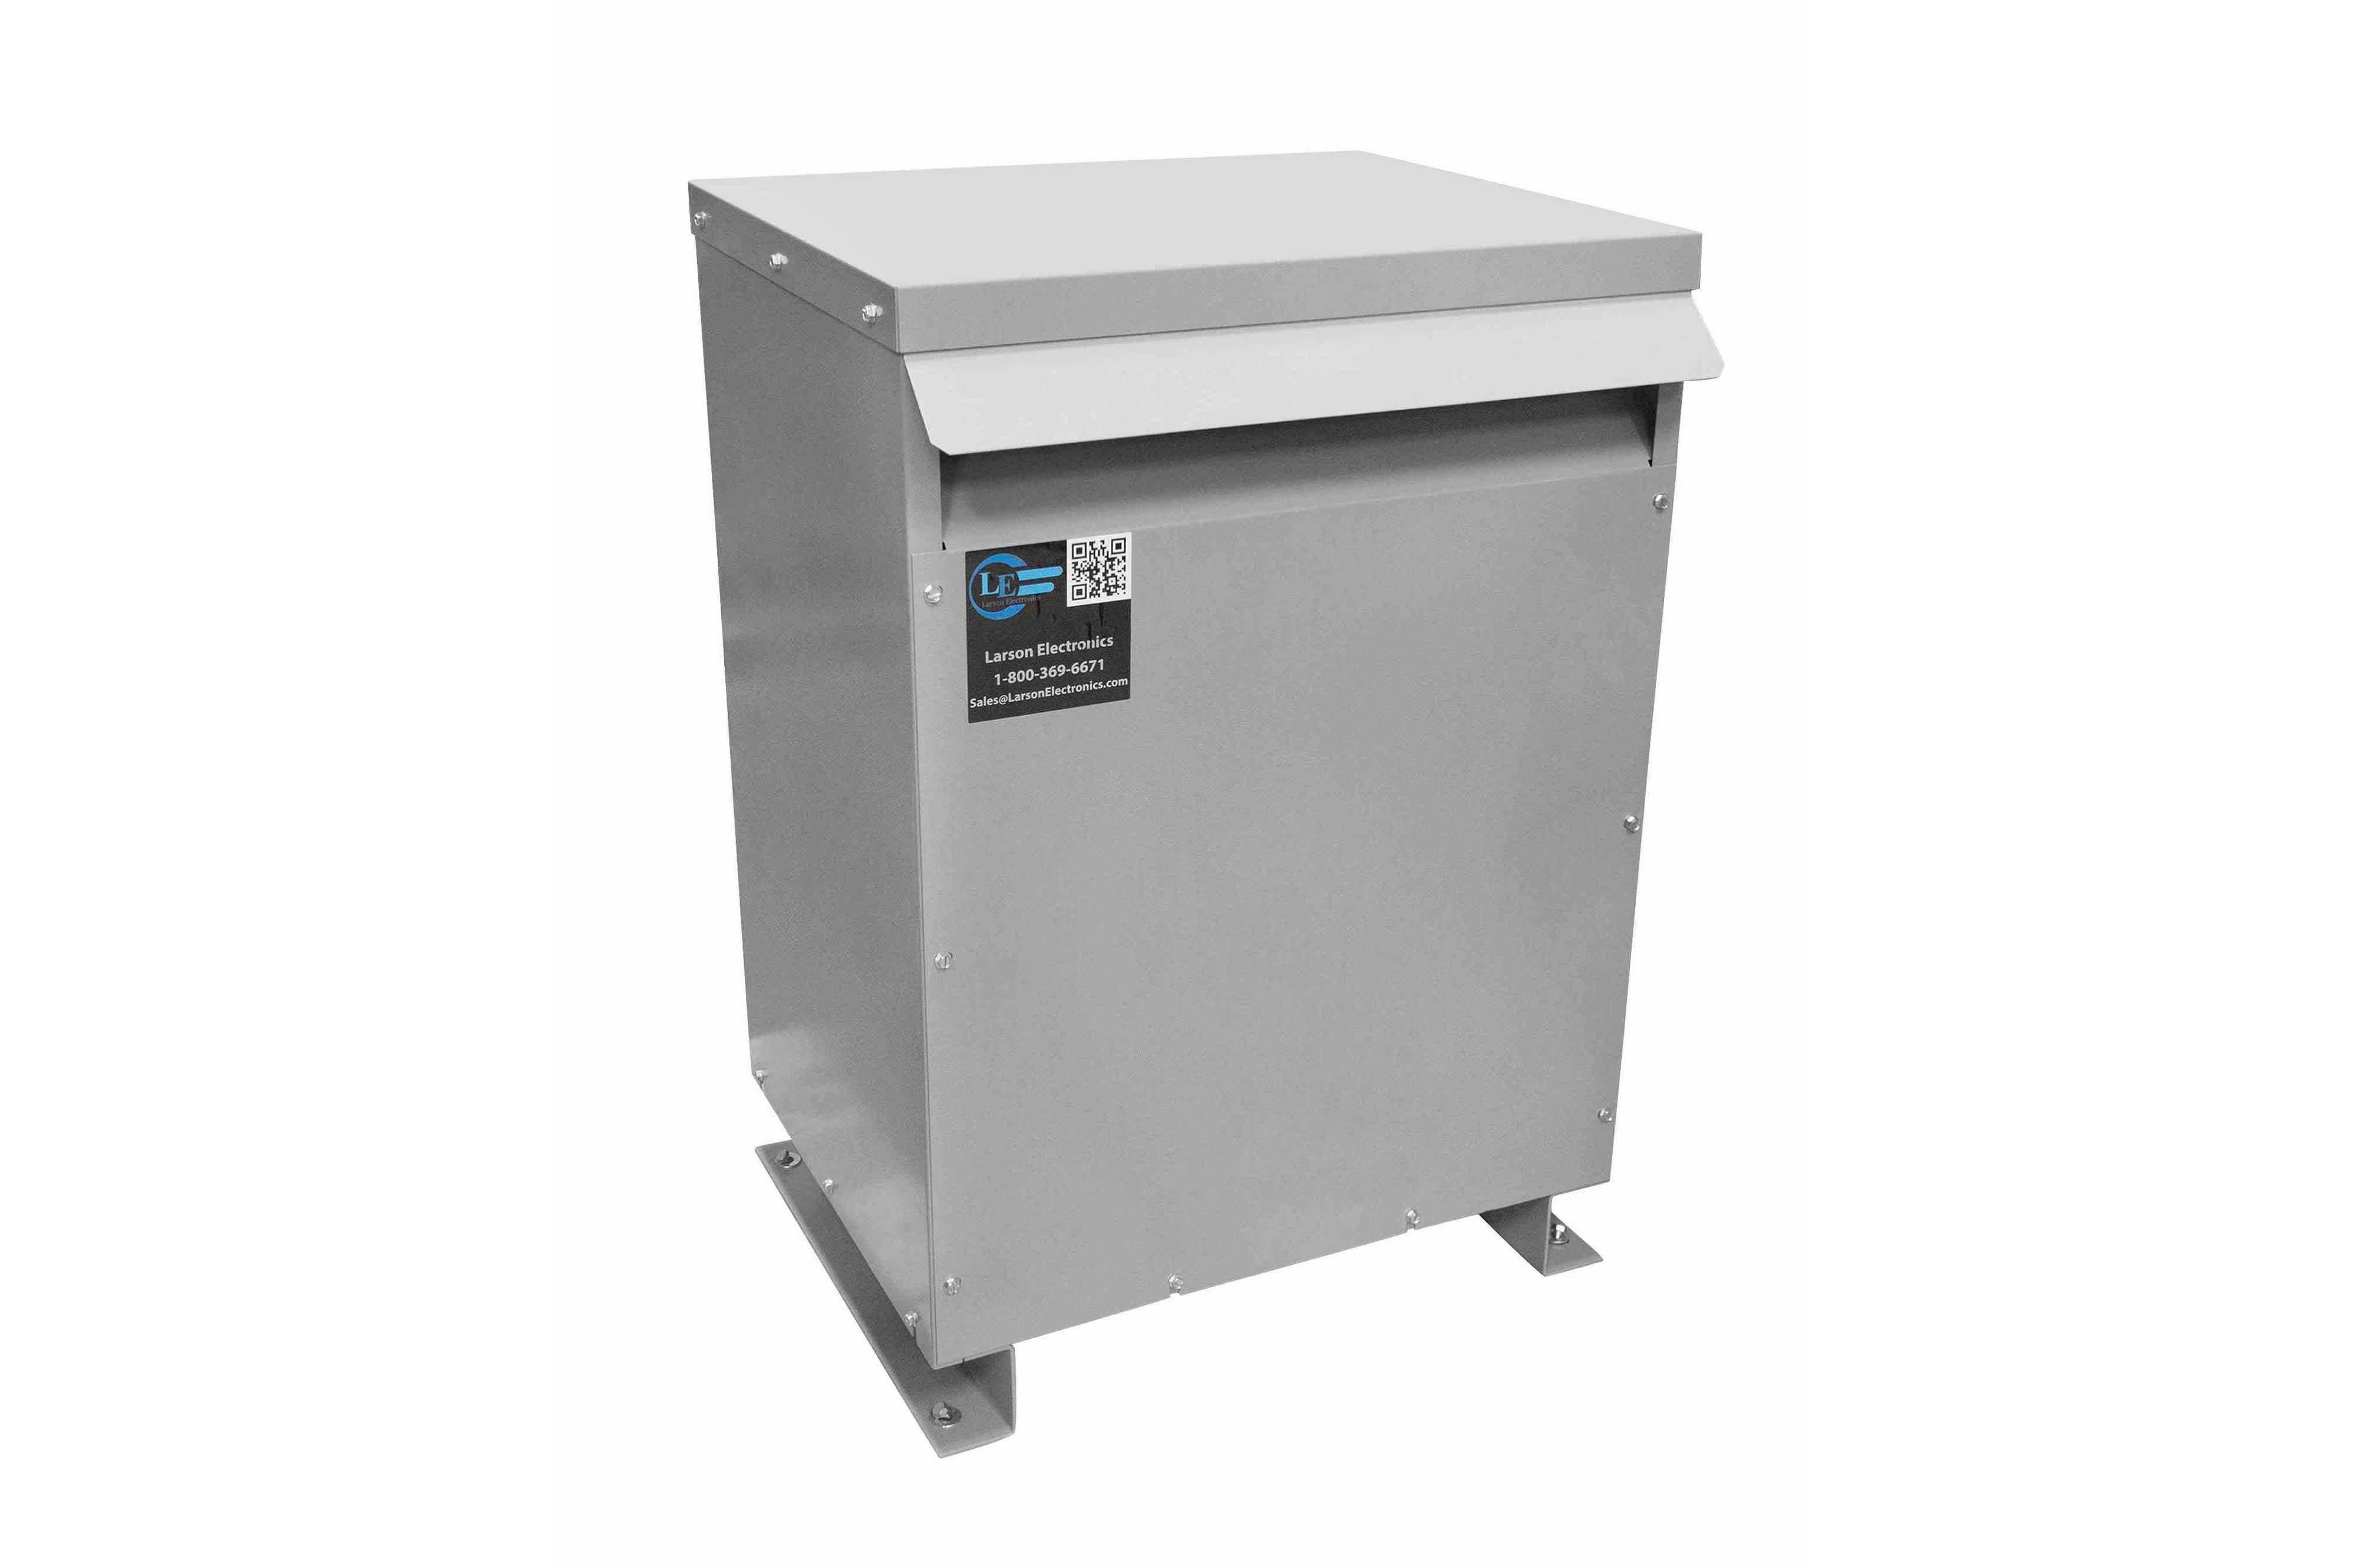 100 kVA 3PH Isolation Transformer, 208V Wye Primary, 415V Delta Secondary, N3R, Ventilated, 60 Hz